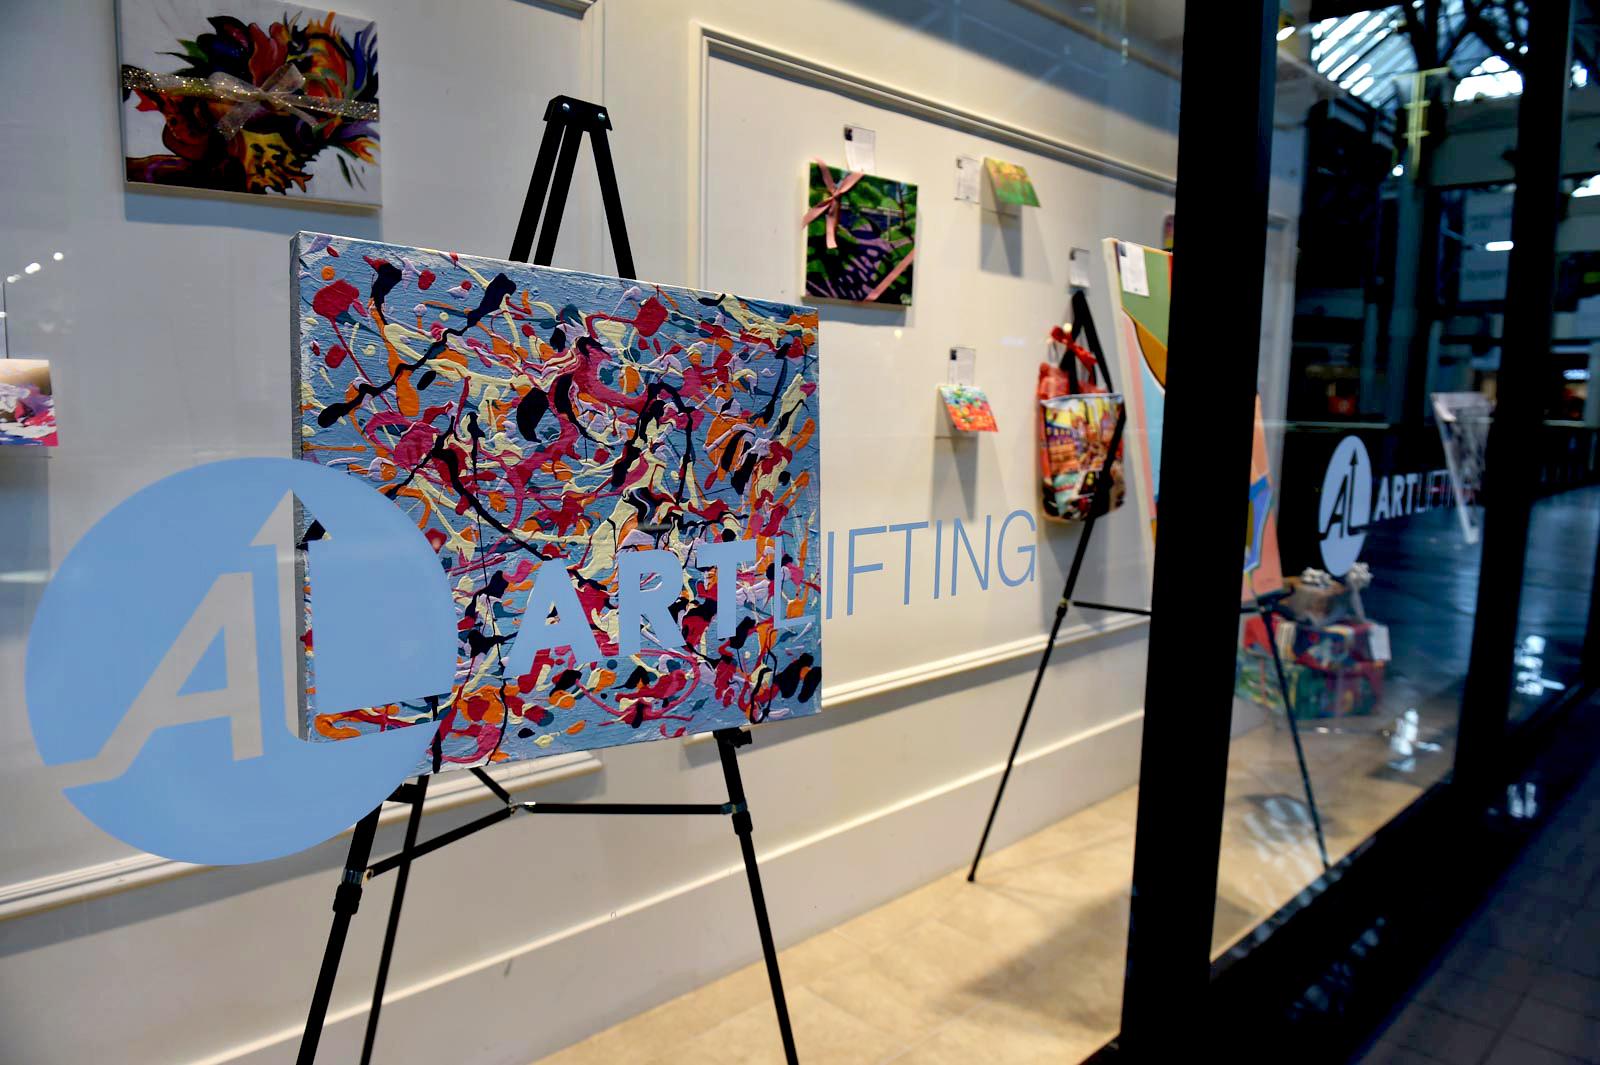 Artlifting_MaddieMalhotra_online